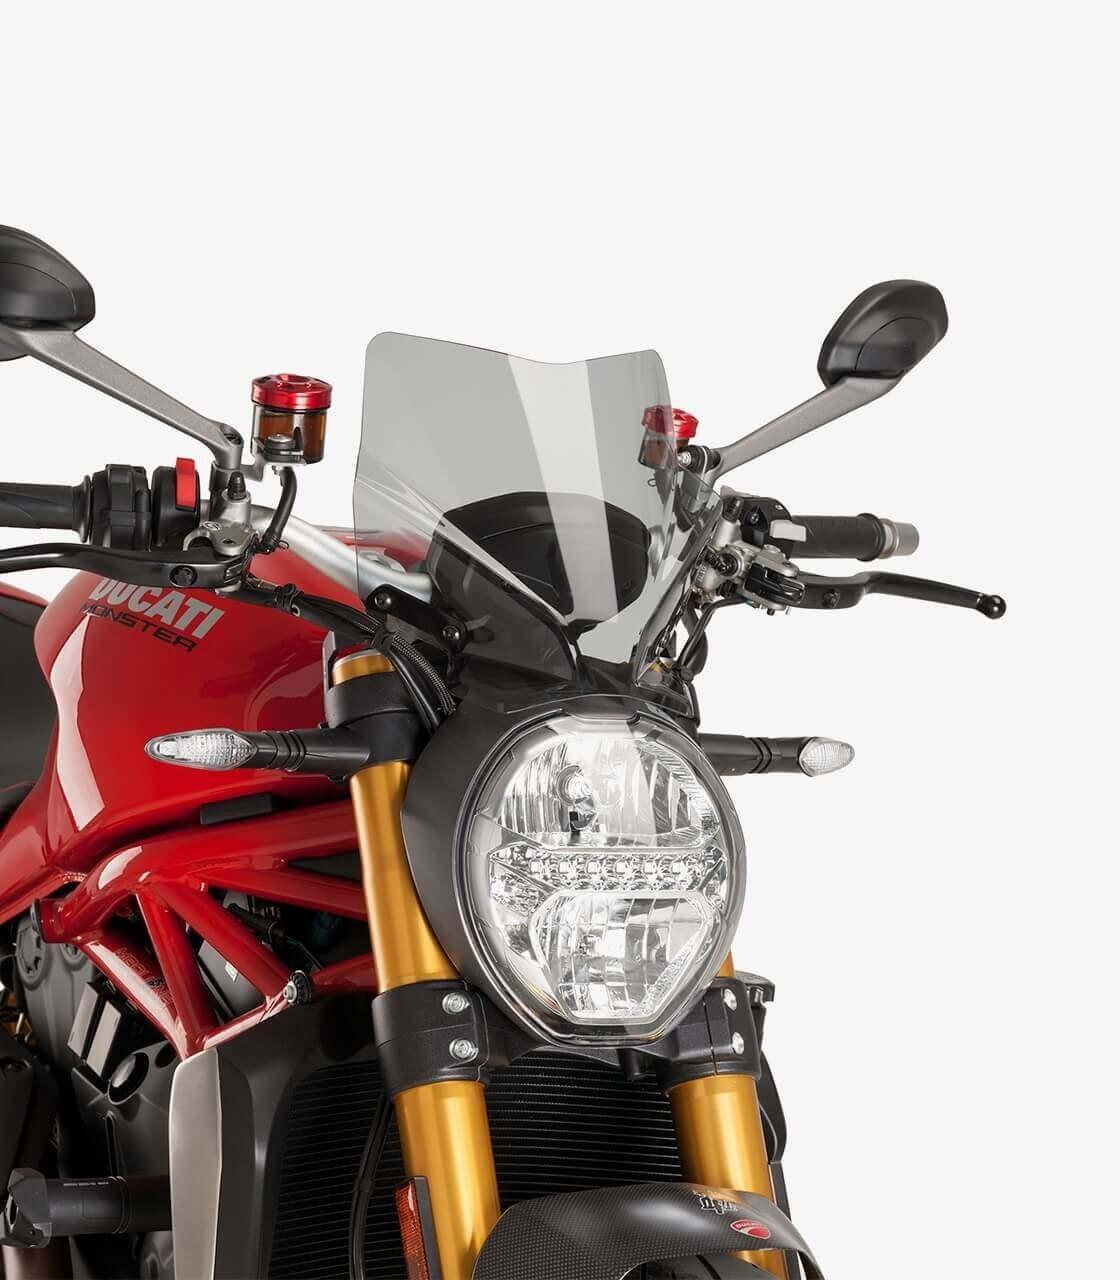 Cúpula Puig Naked New Generation Sport Honda CB1000R Negro